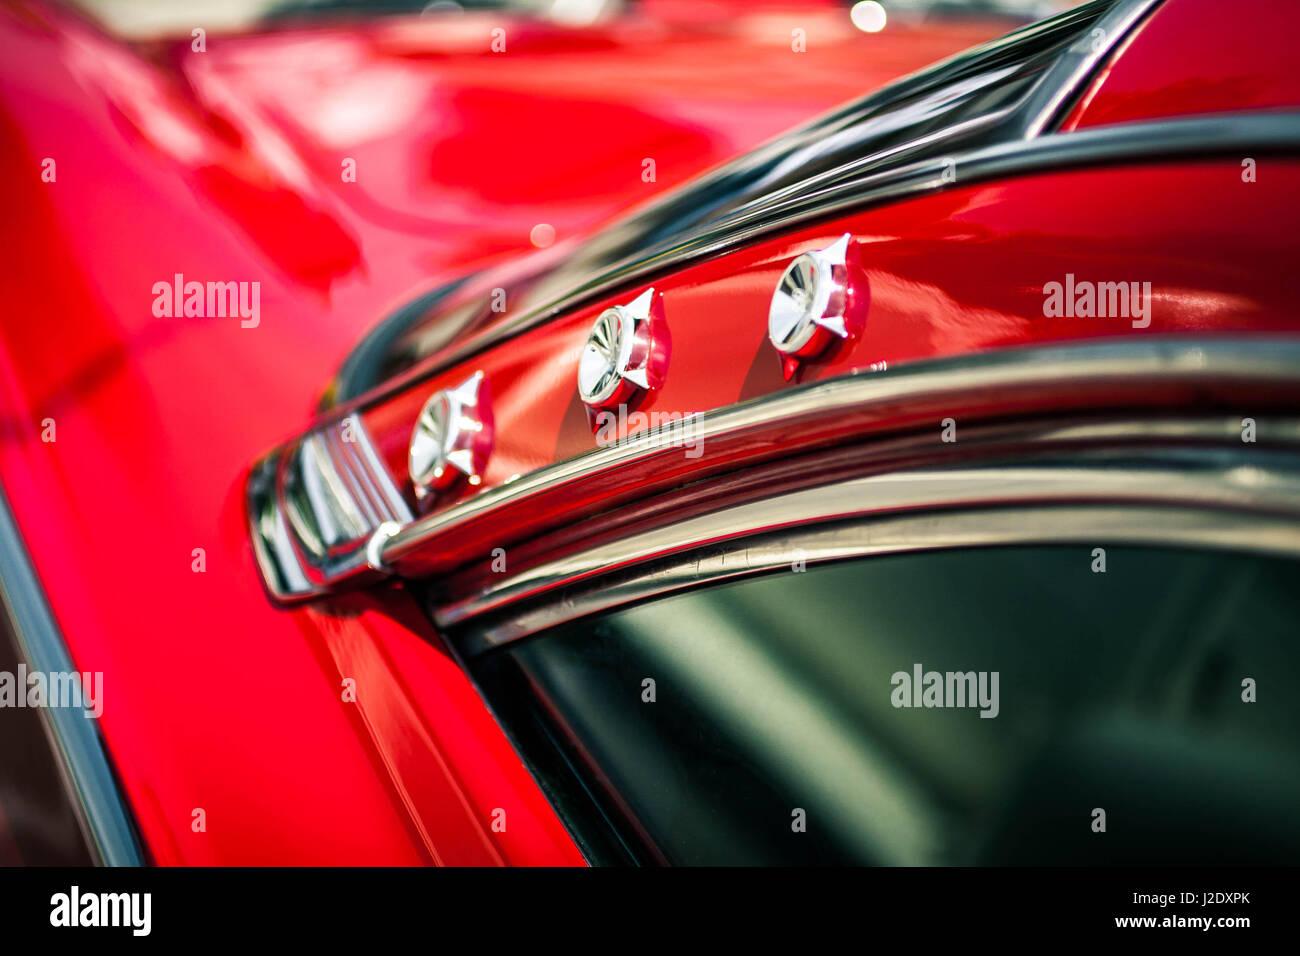 RedRoof_0583   - Stock Image